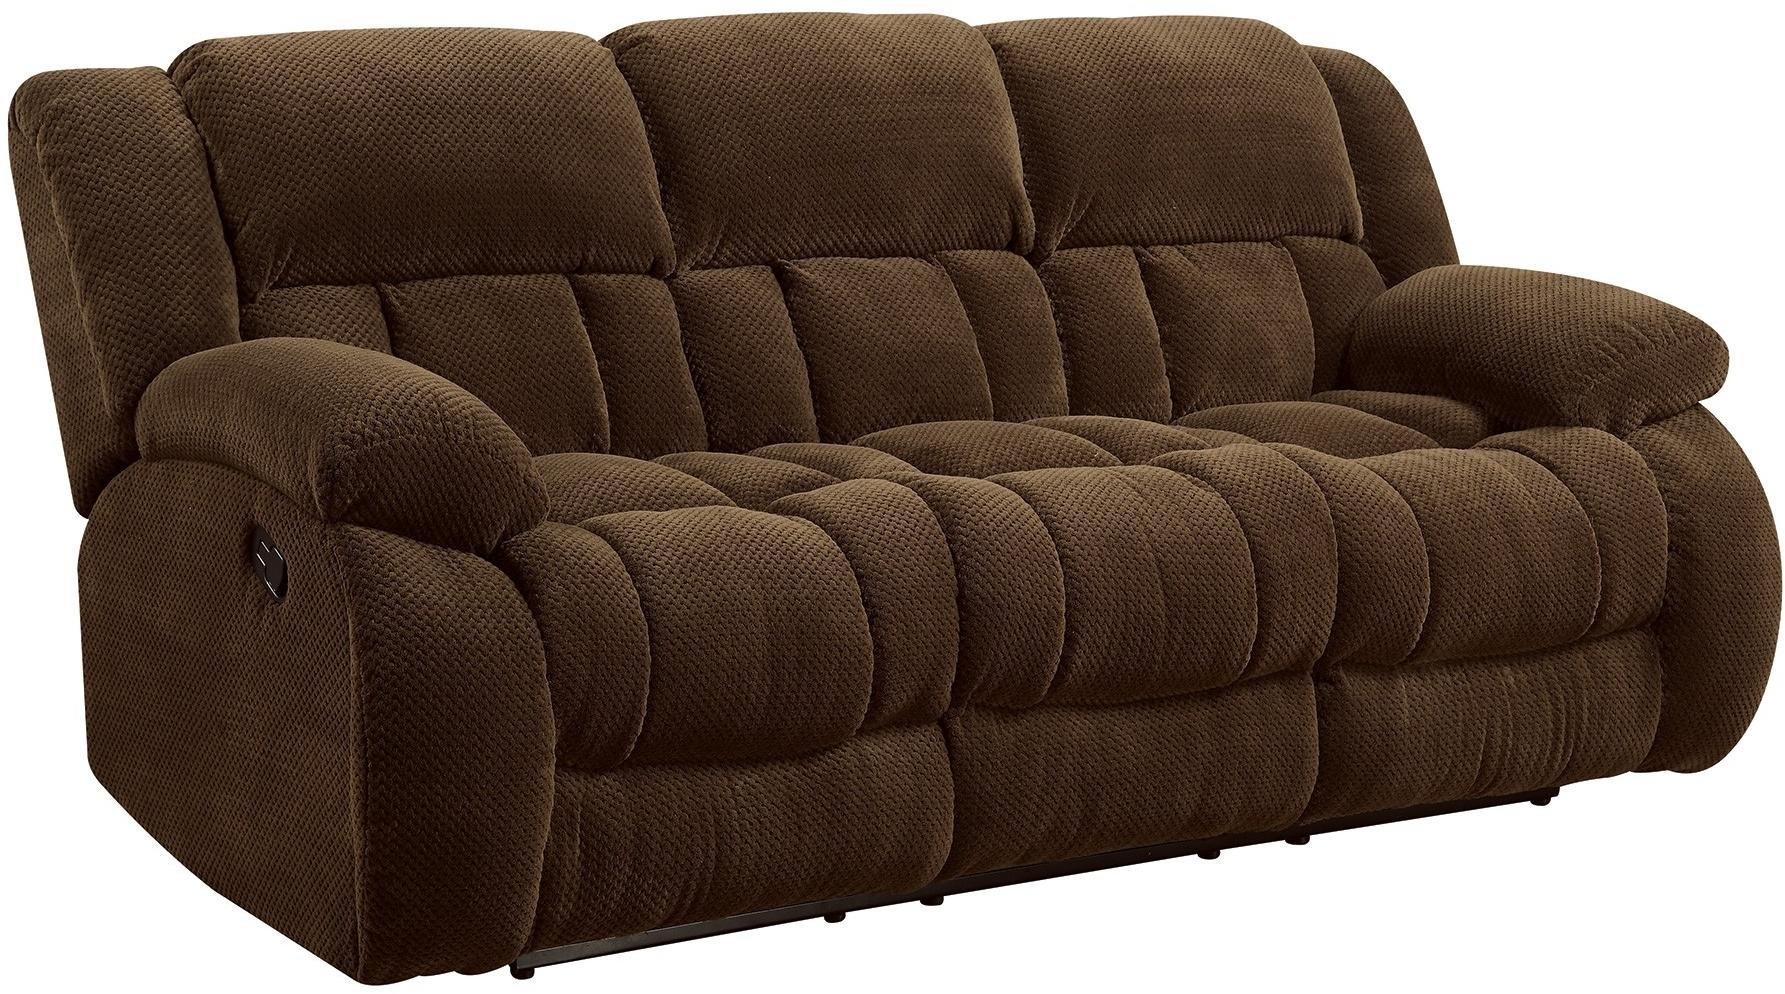 Coaster Home Furnishings Weissman Pillow Padded Motion Sofa Chocolate by Coaster Home Furnishings